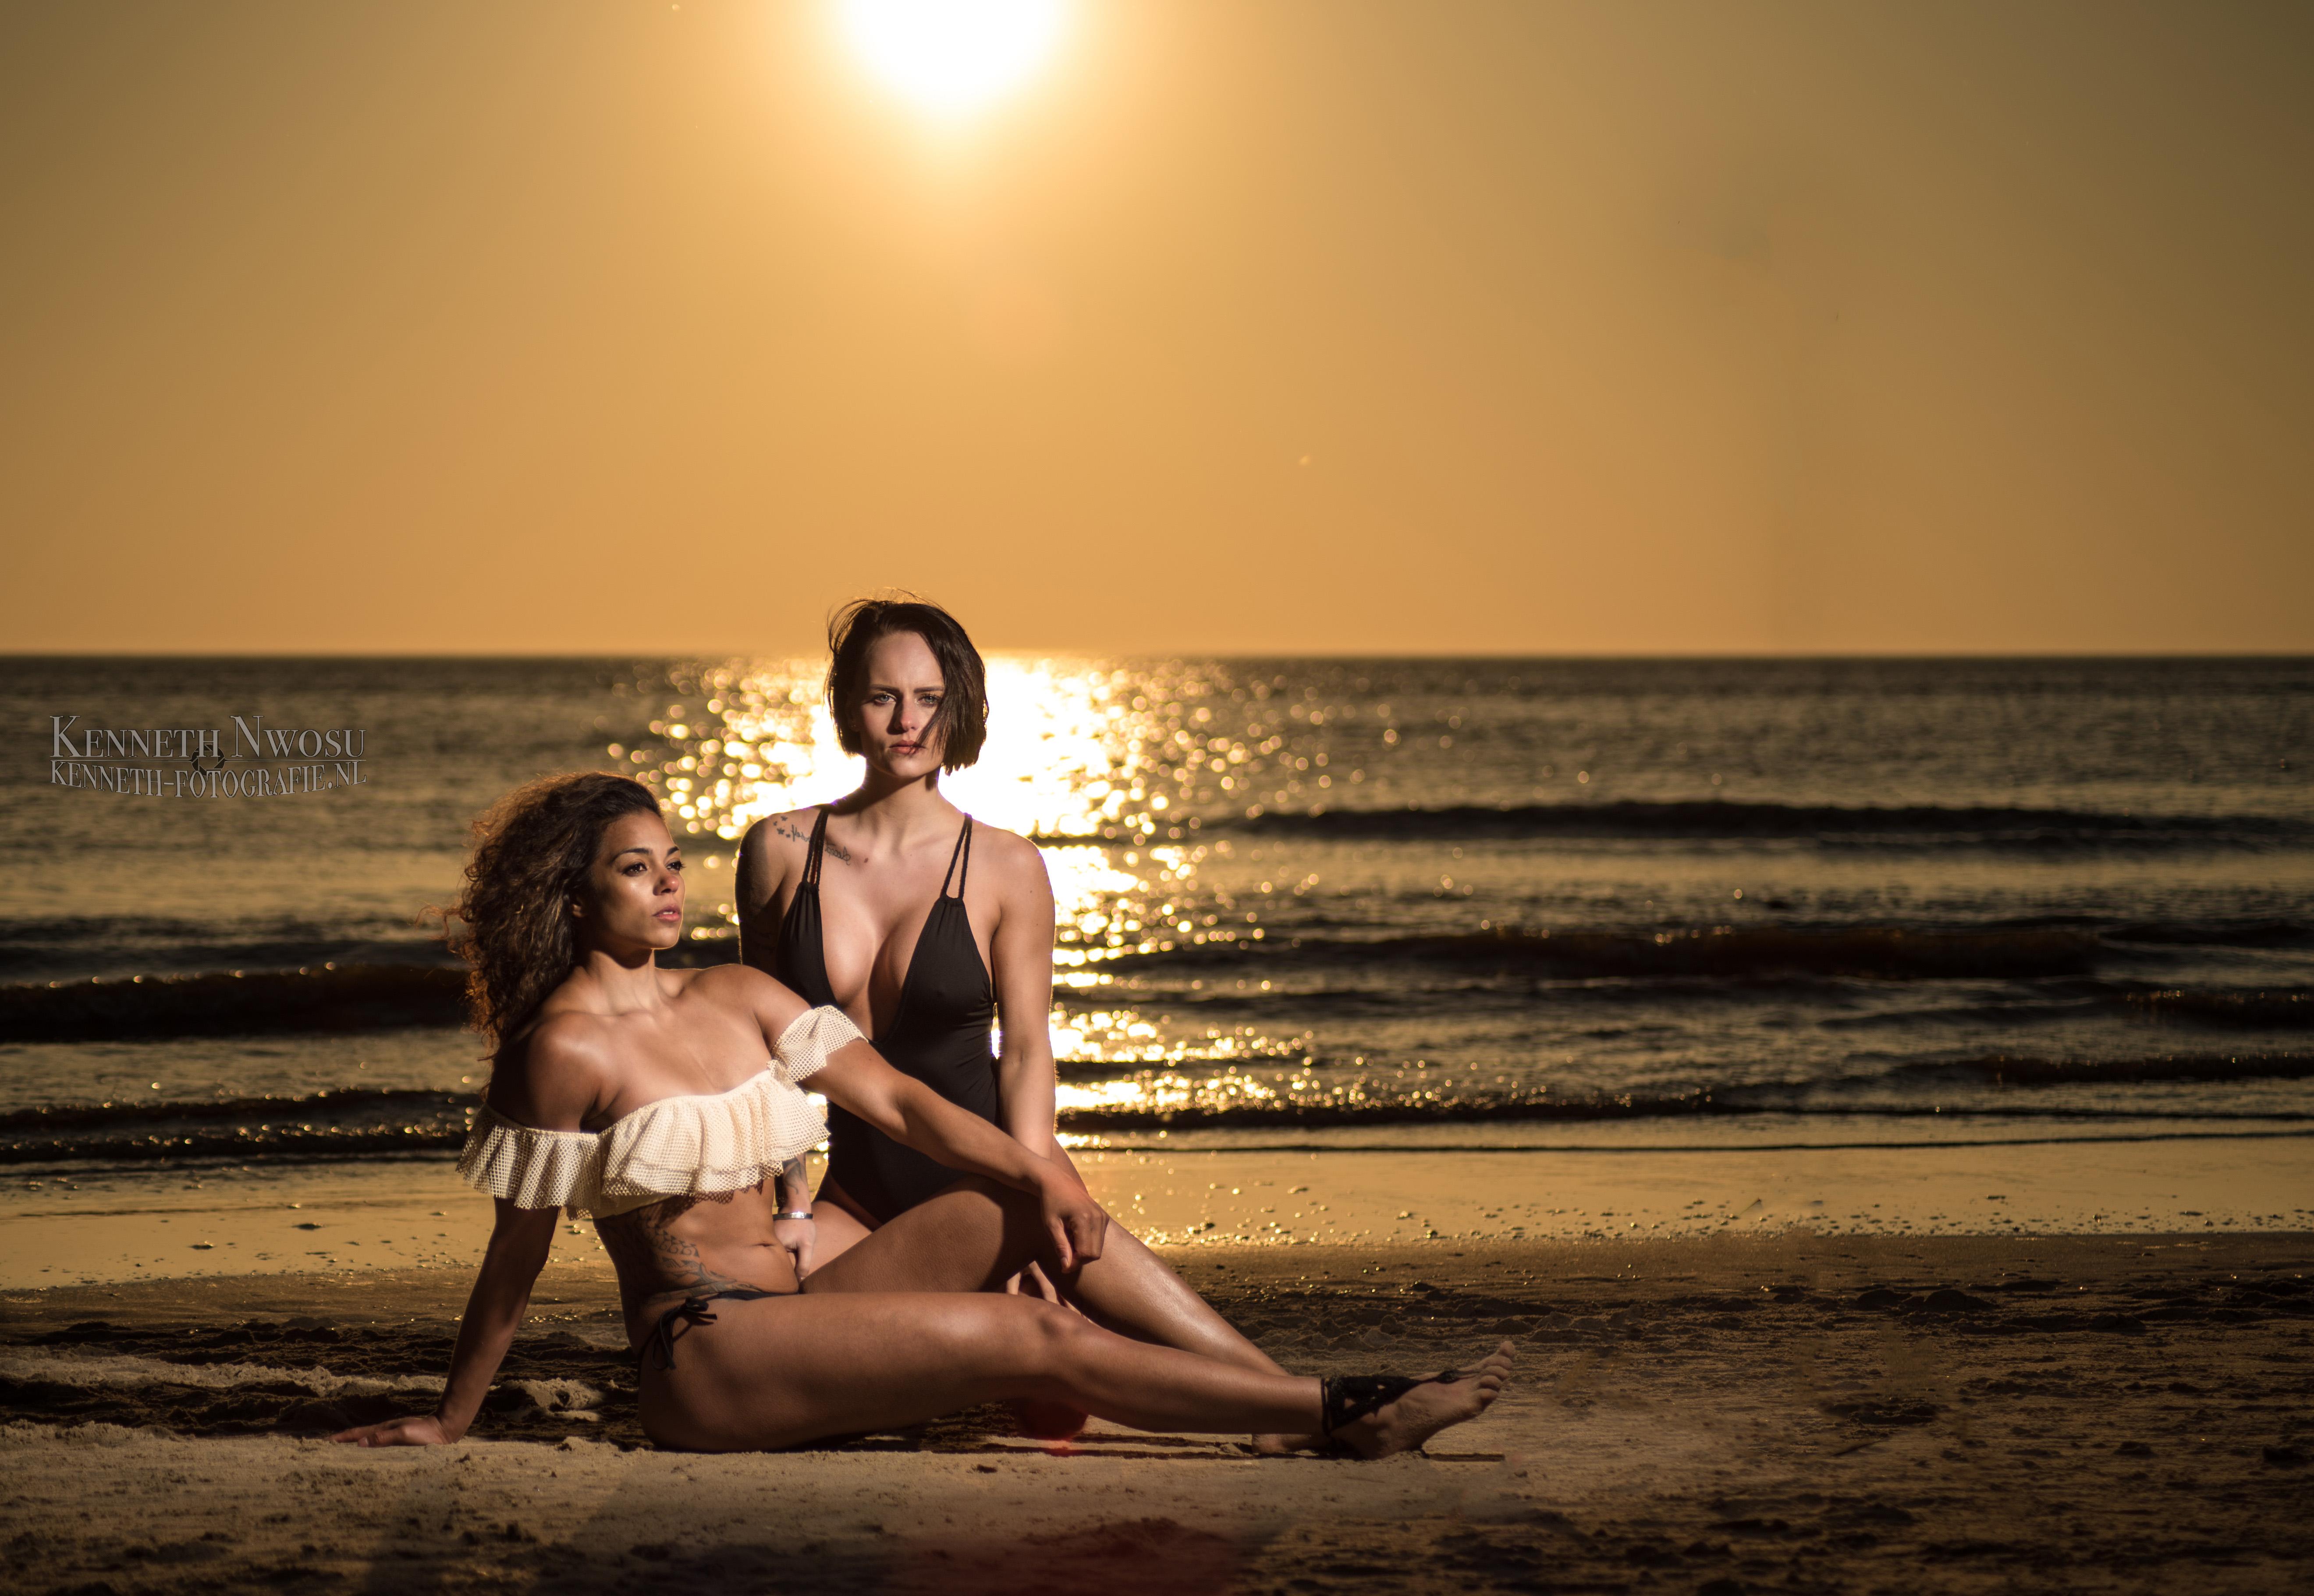 Beachshoot Cheila Baronet en Sylke Kempe